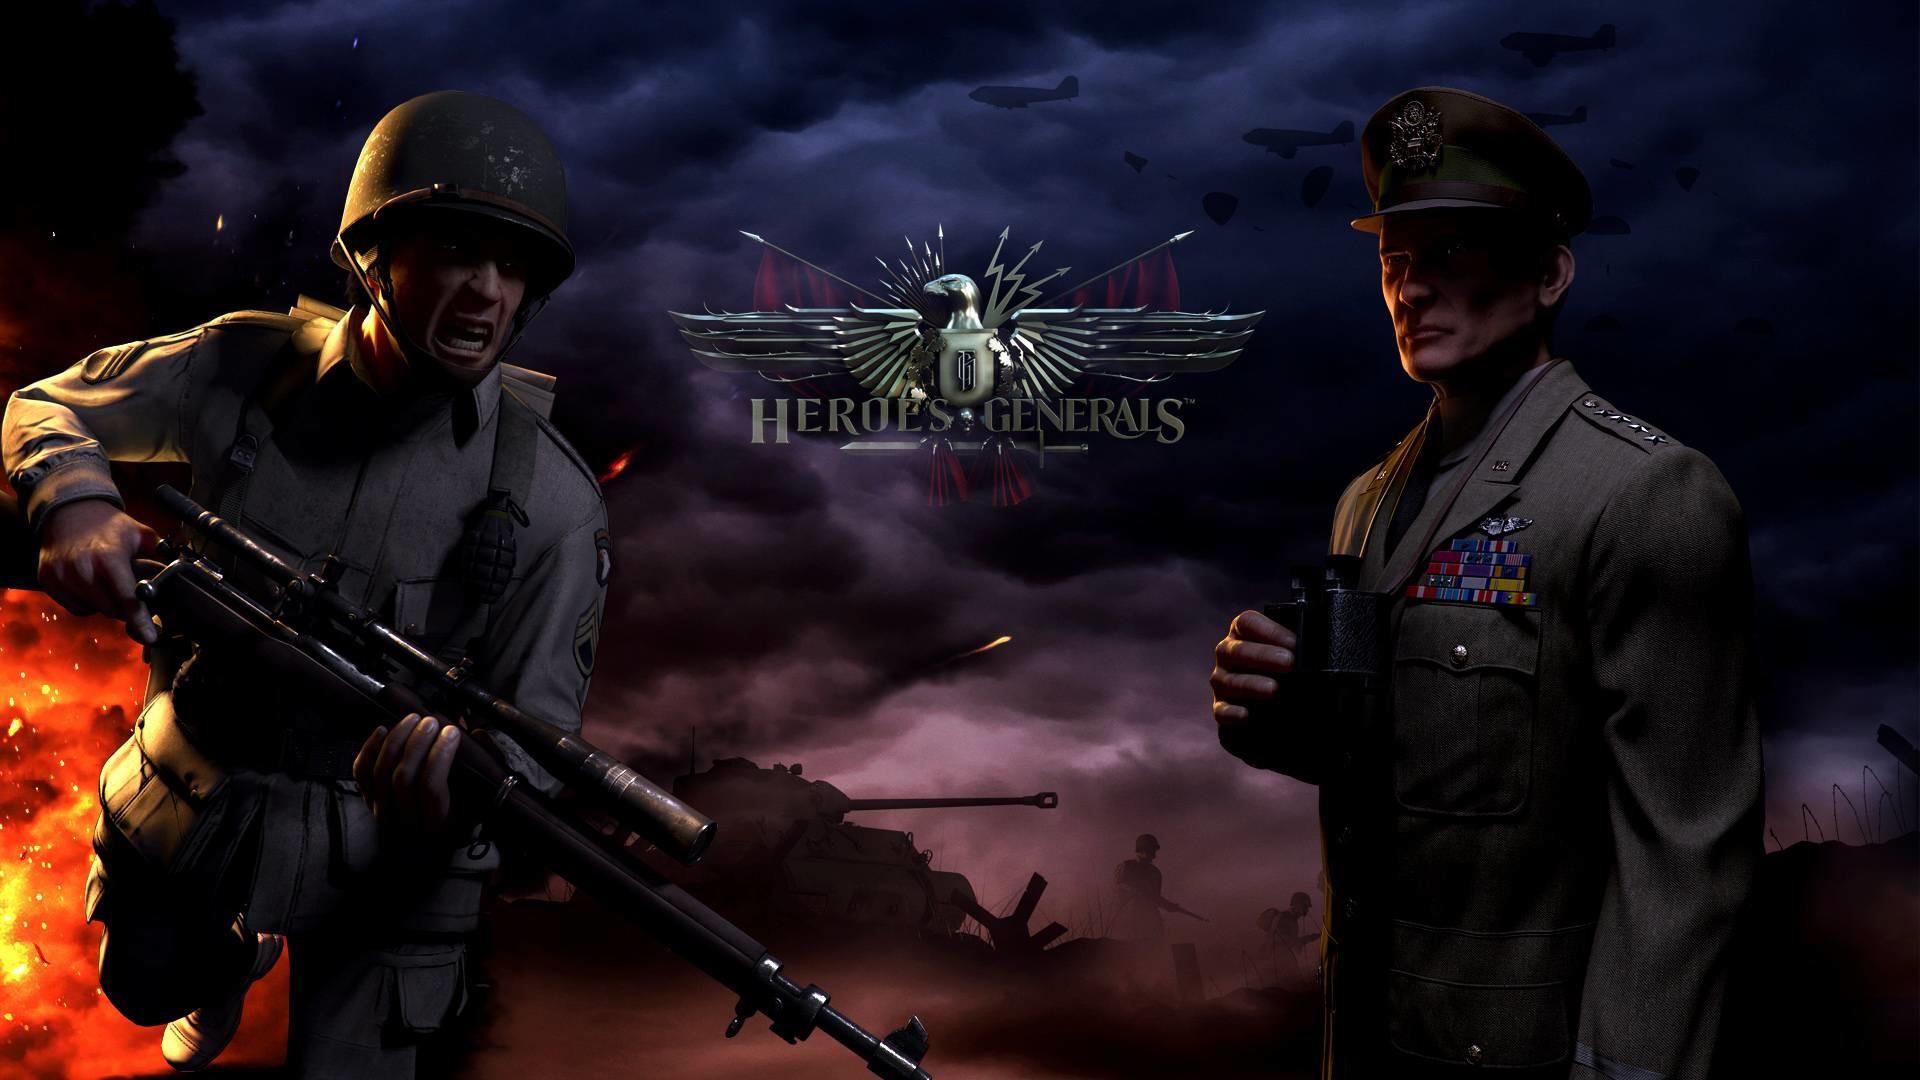 Heroes-and-Generals-wallpaper-2.jpg